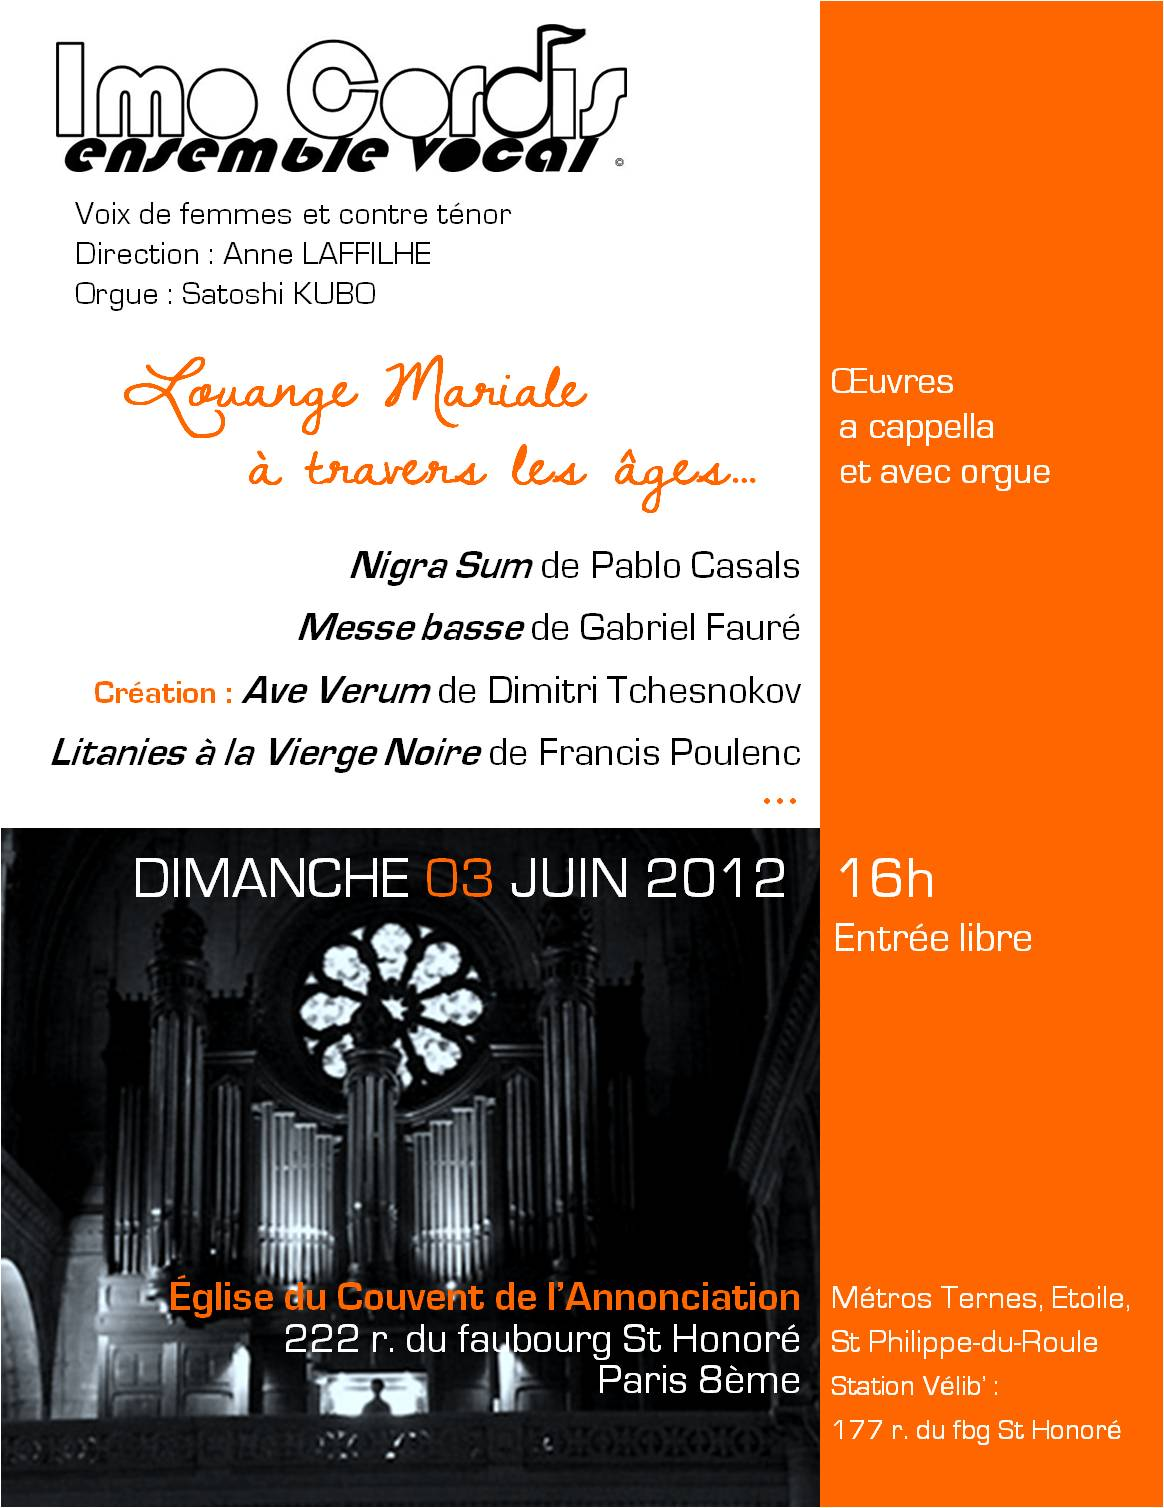 _imocordis_Affiche concert 03 juin